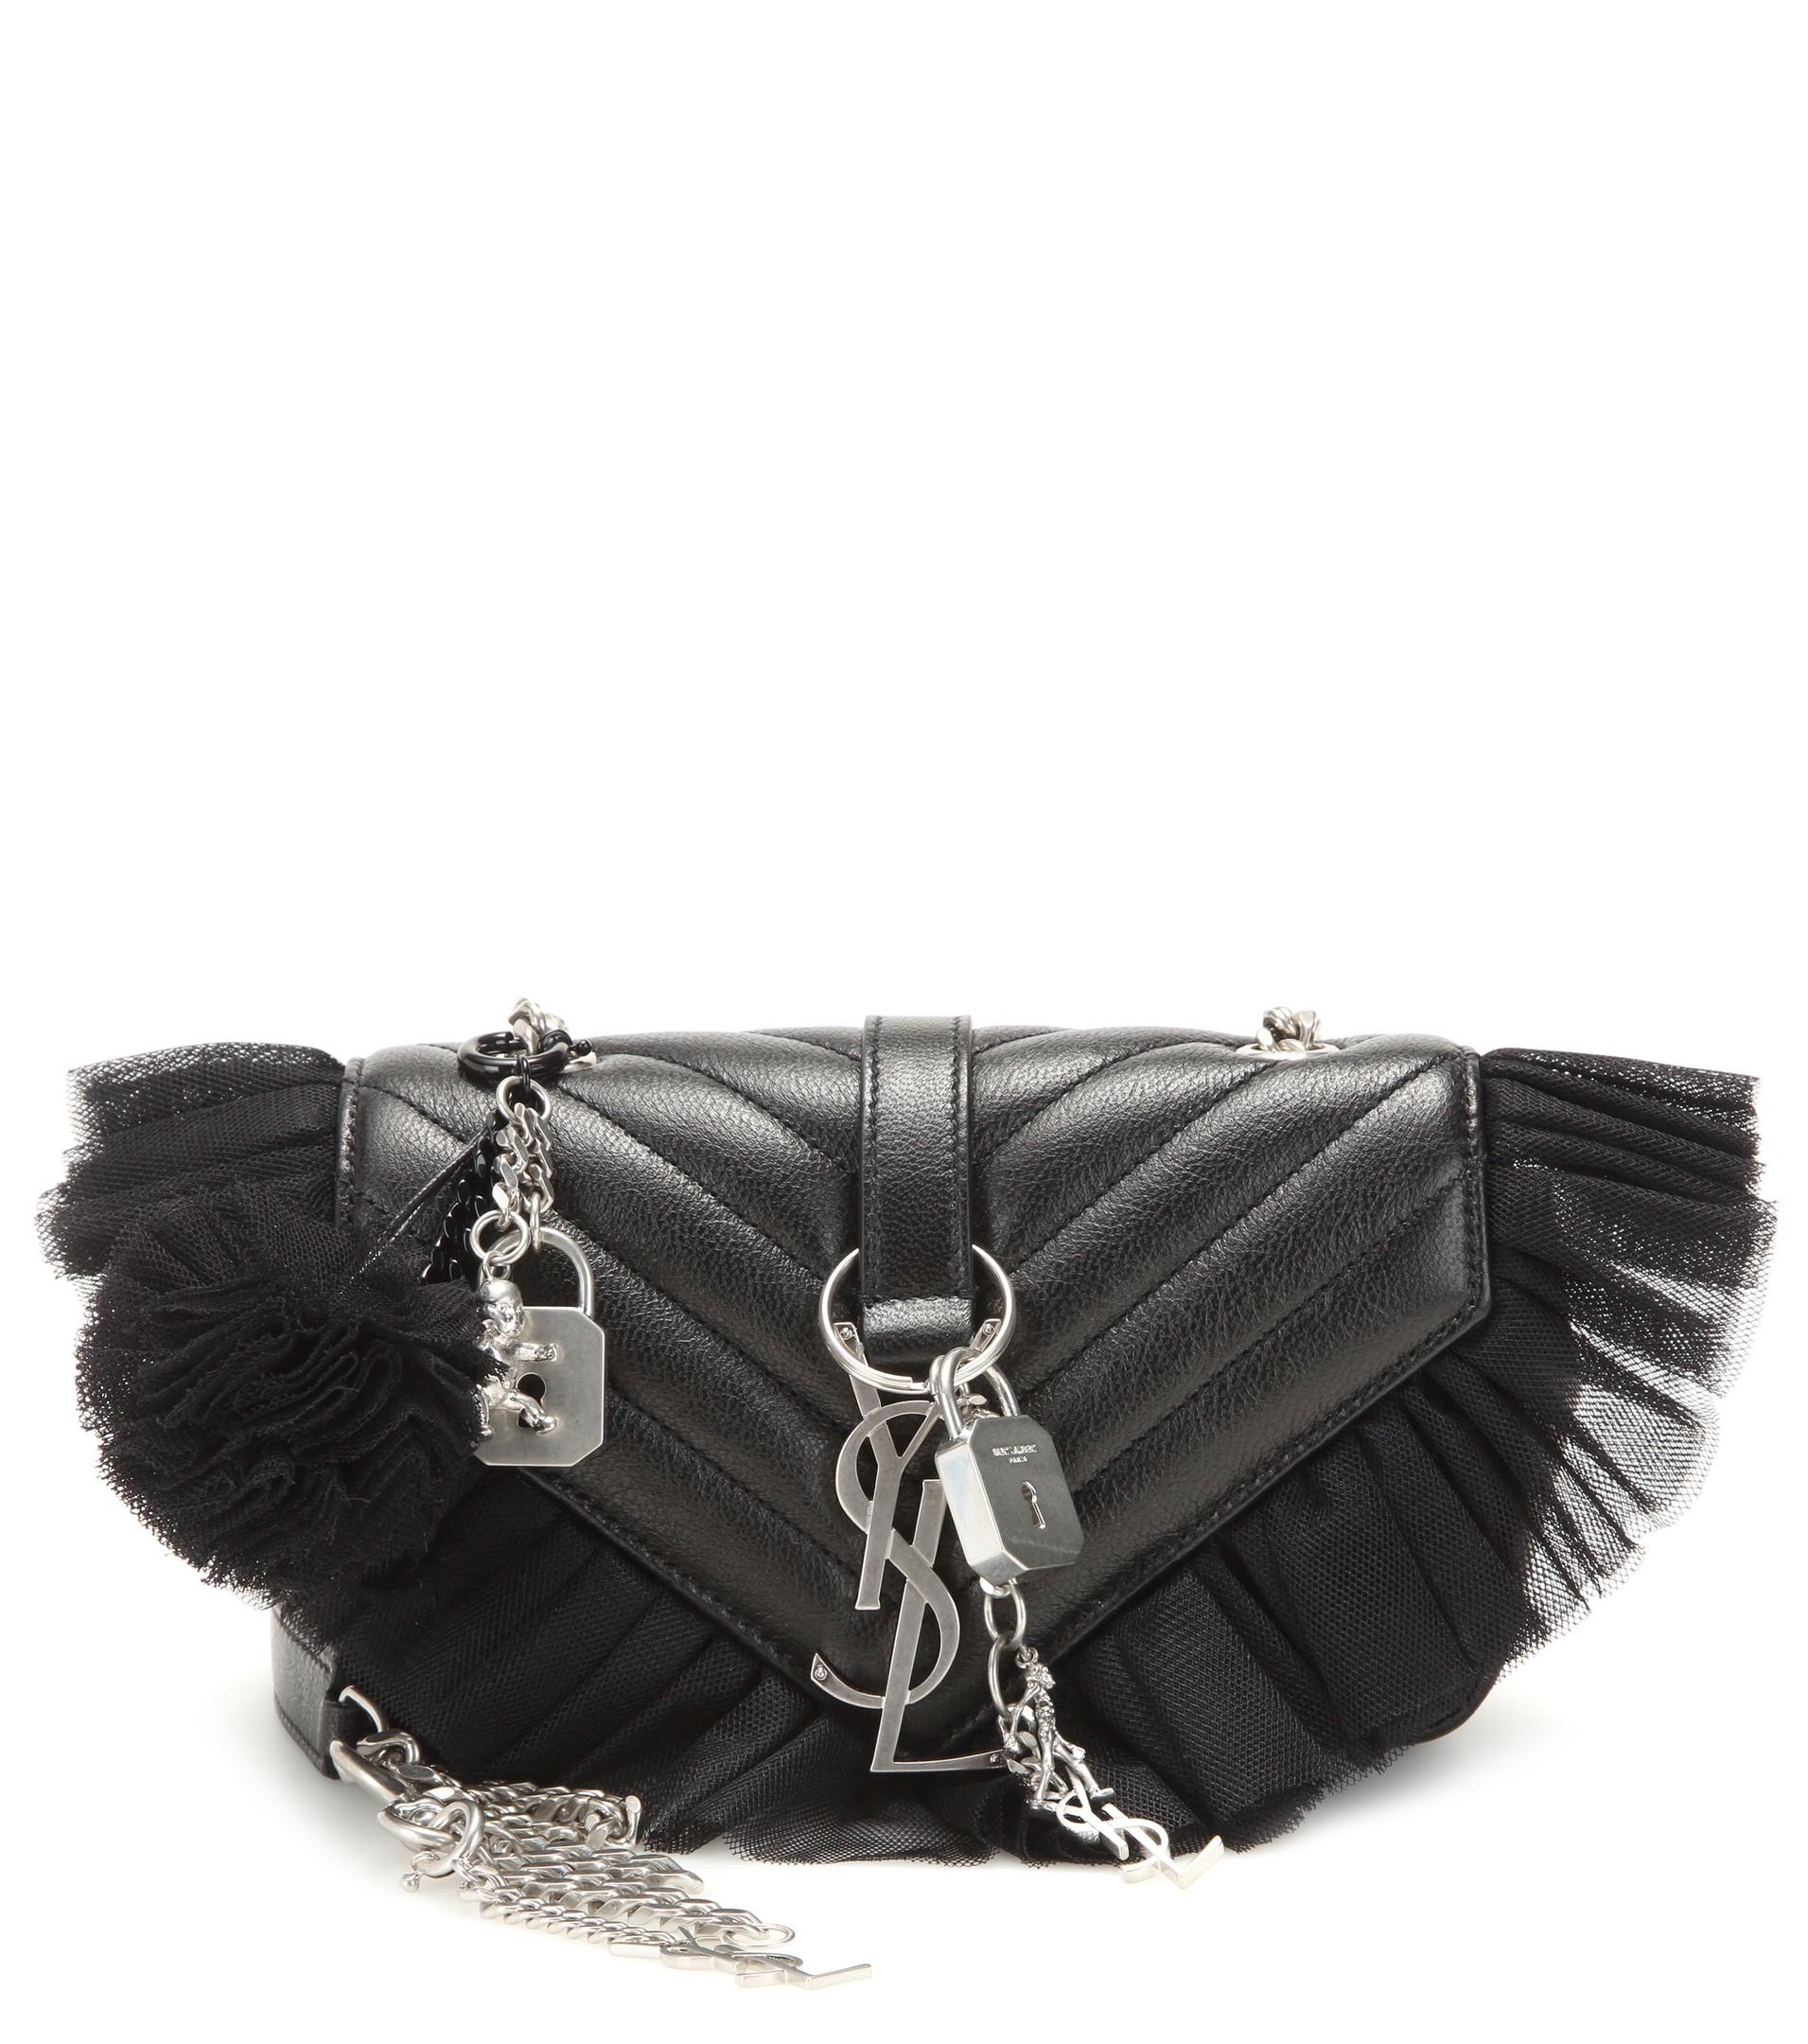 red suede purse - Saint Laurent Classic Baby Monogram Saint Laurent Chain Bag In ...